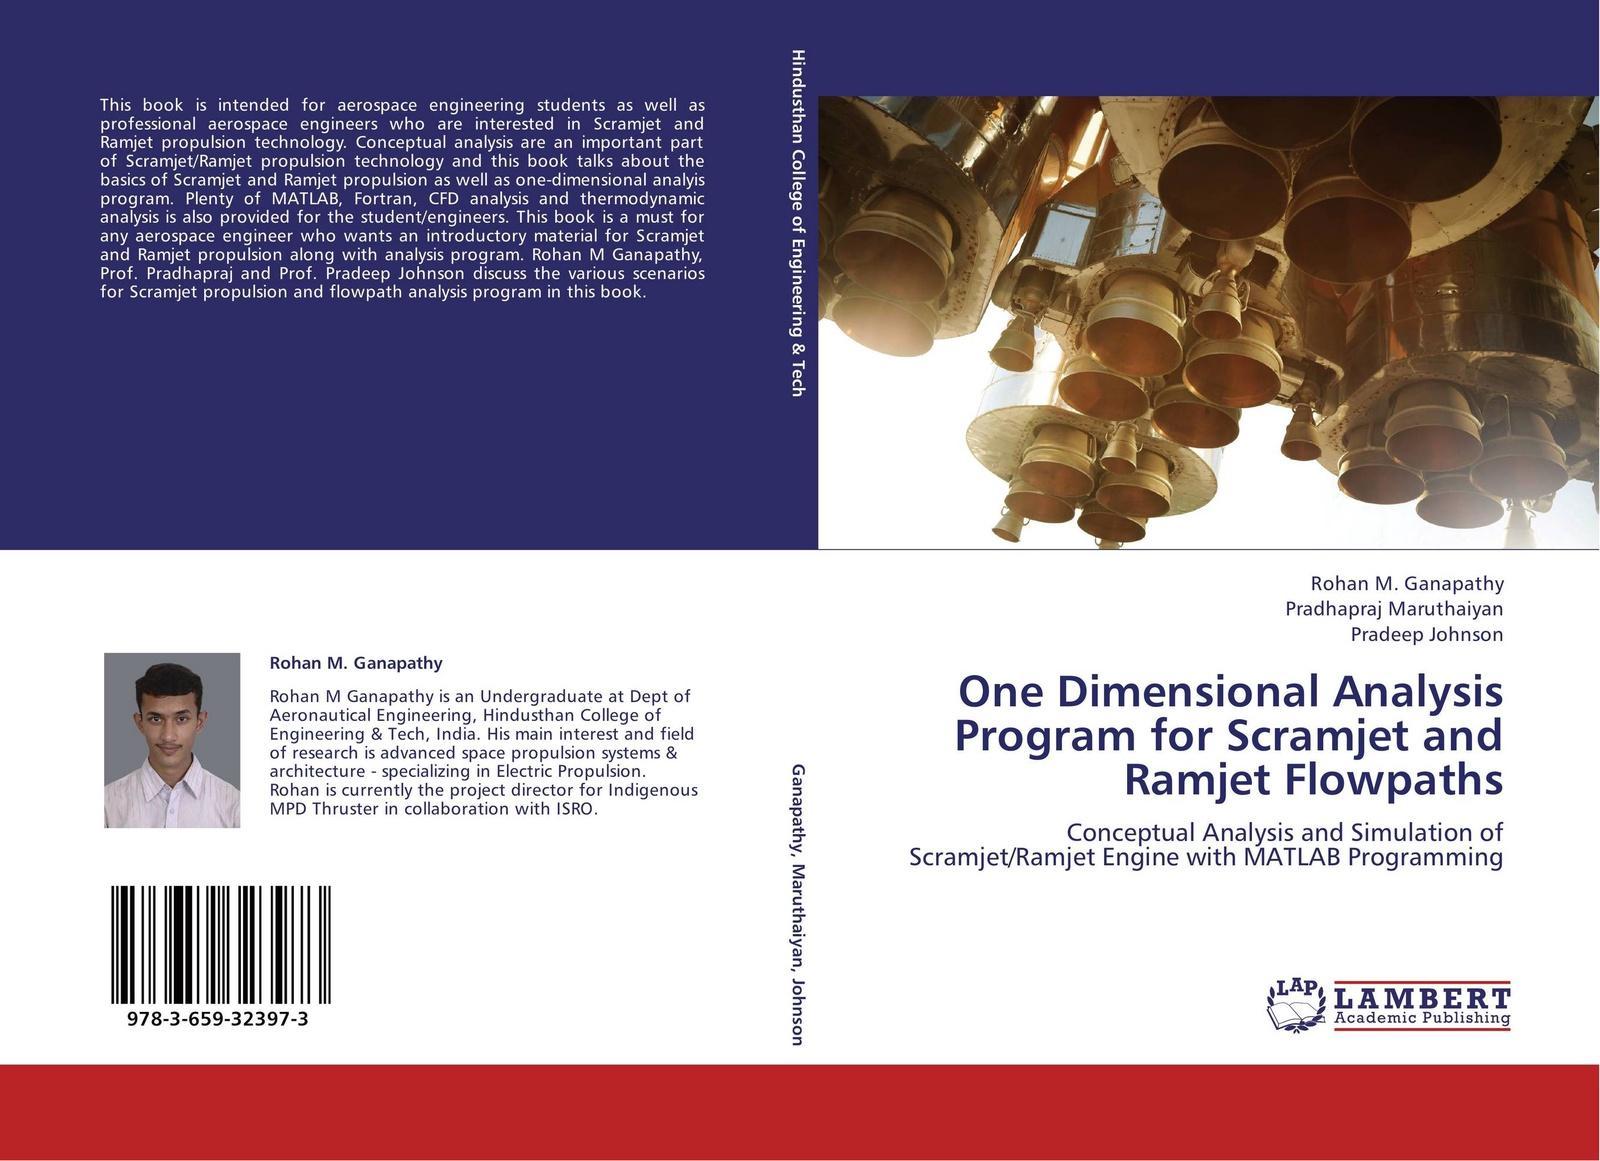 Rohan M. Ganapathy,Pradhapraj Maruthaiyan and Pradeep Johnson One Dimensional Analysis Program for Scramjet and Ramjet Flowpaths